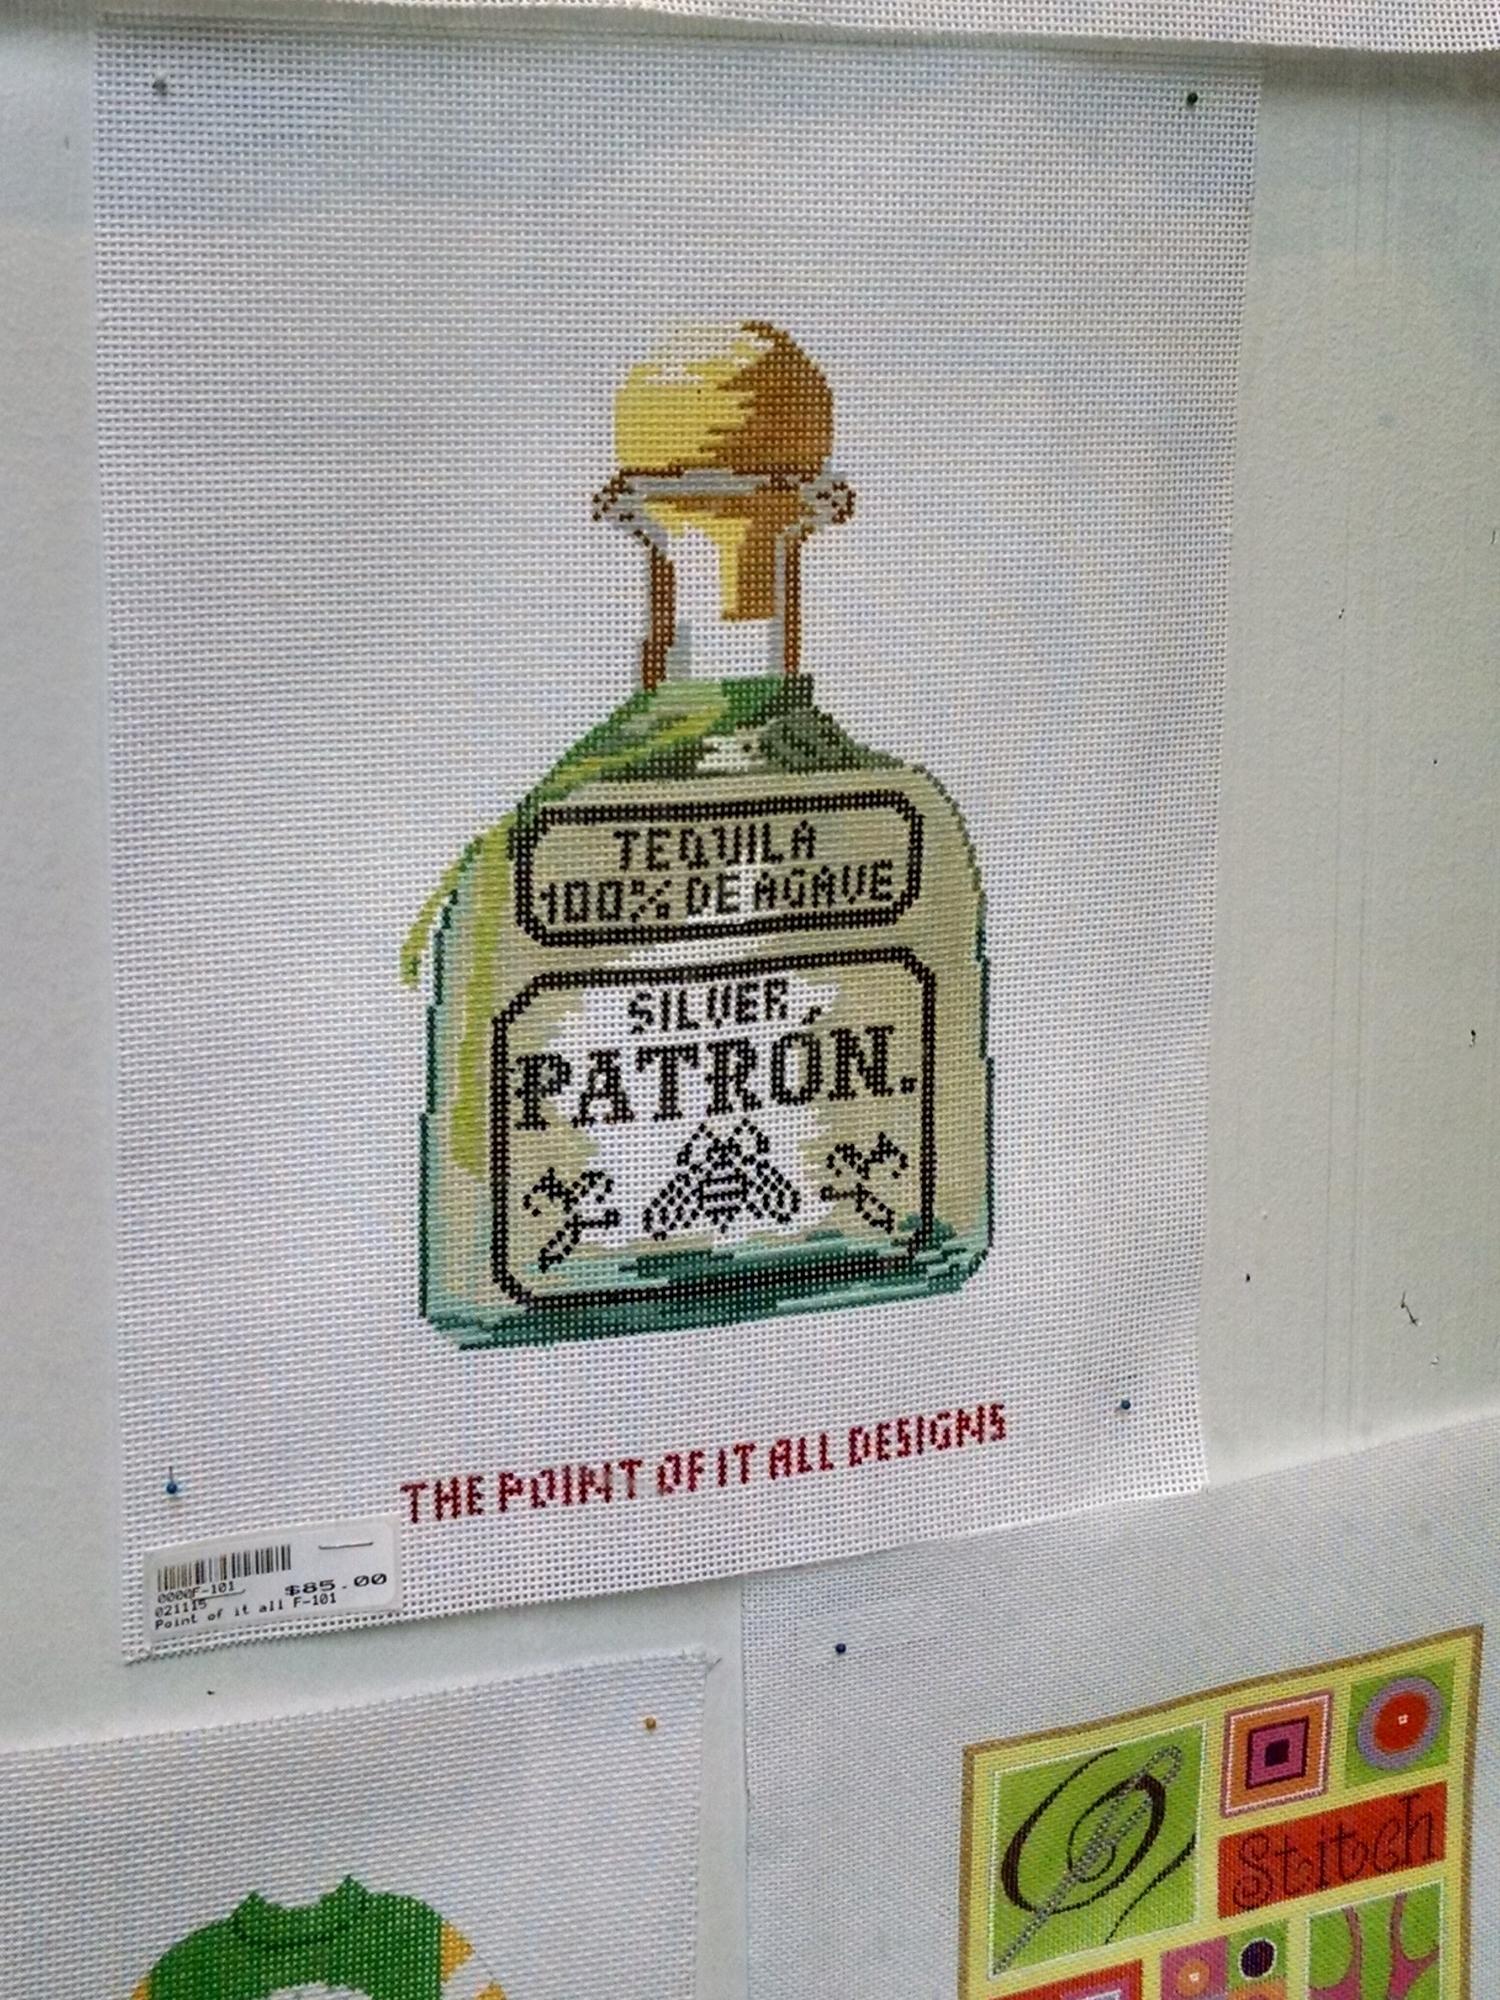 Tequila Sampler